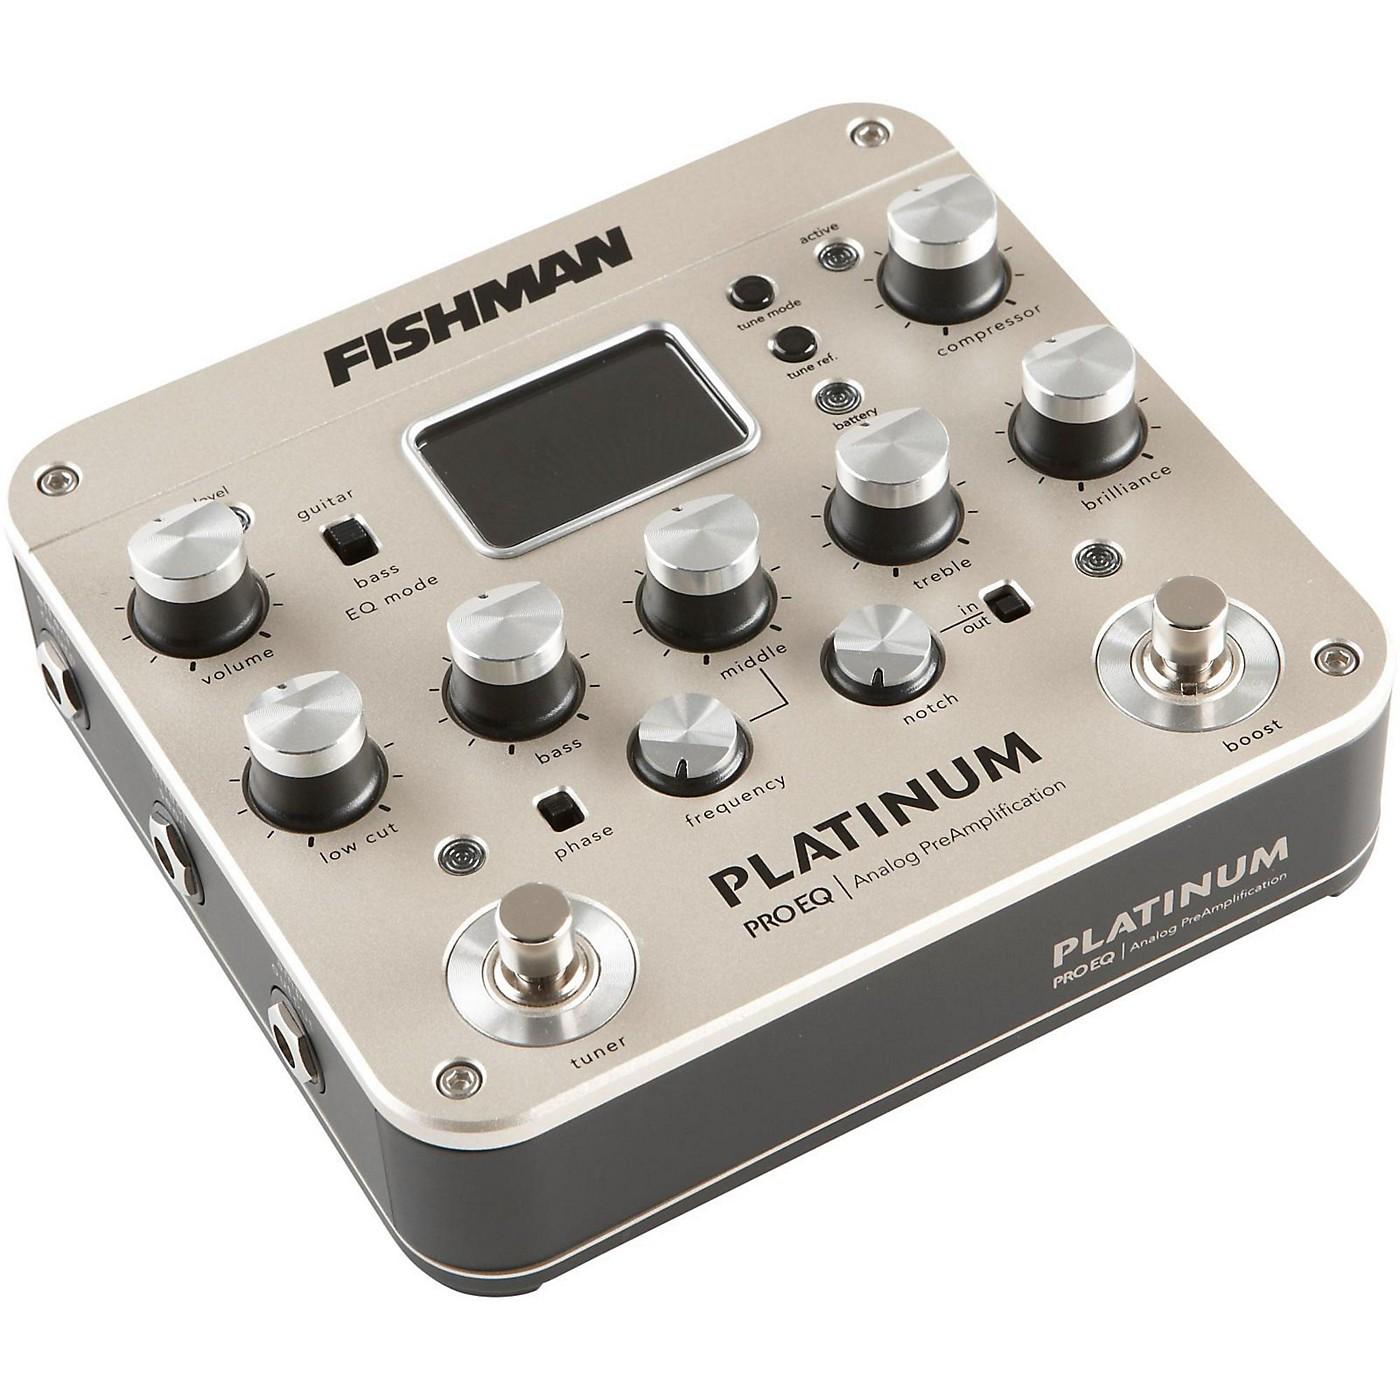 Fishman Platinum Pro EQ Acoustic Guitar Preamp thumbnail